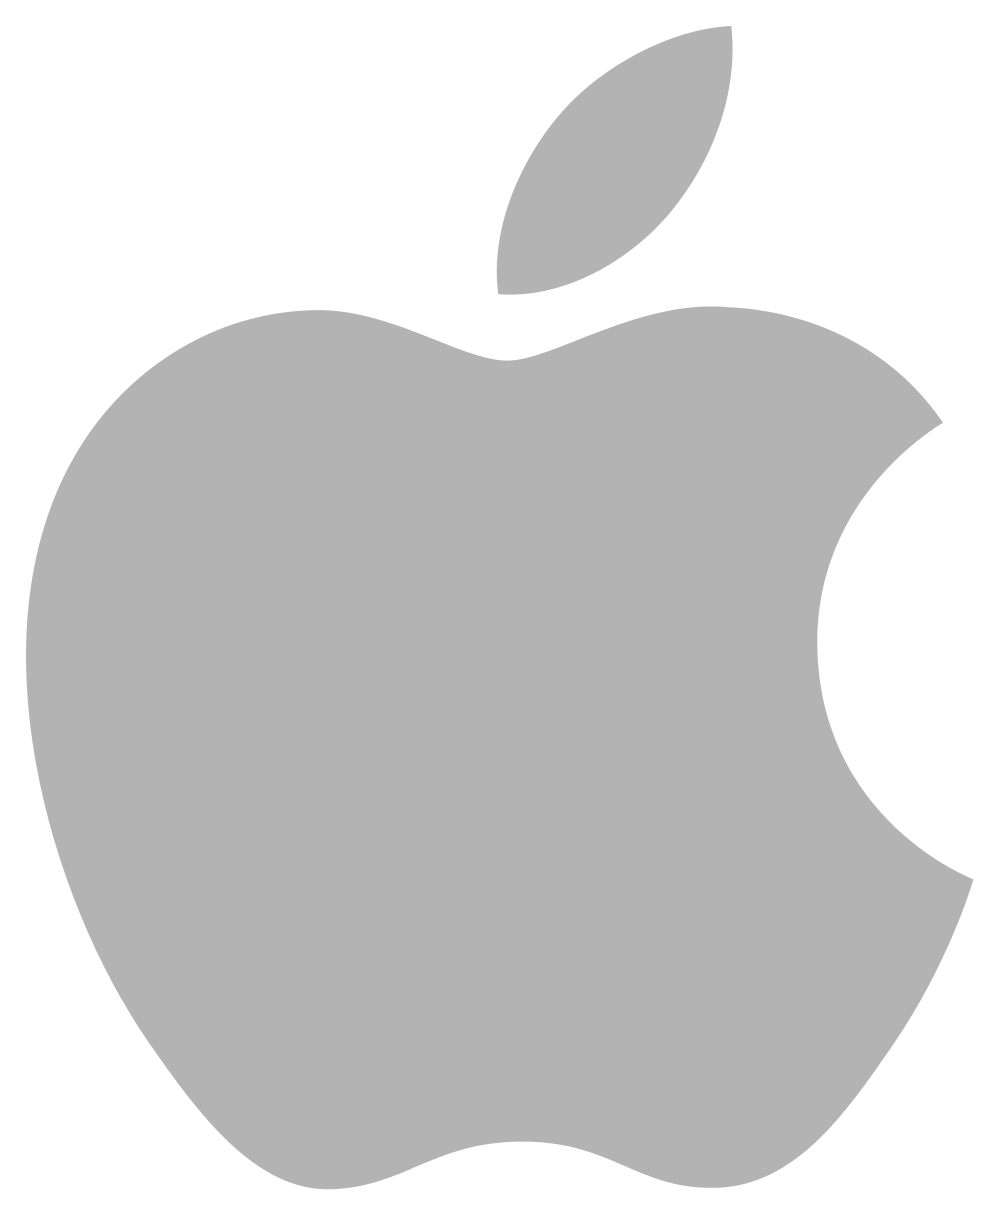 Apple logos or banner clipart vector transparent 500+ Apple LOGO - Latest Apple Logo, Icon, GIF, Transparent PNG vector transparent